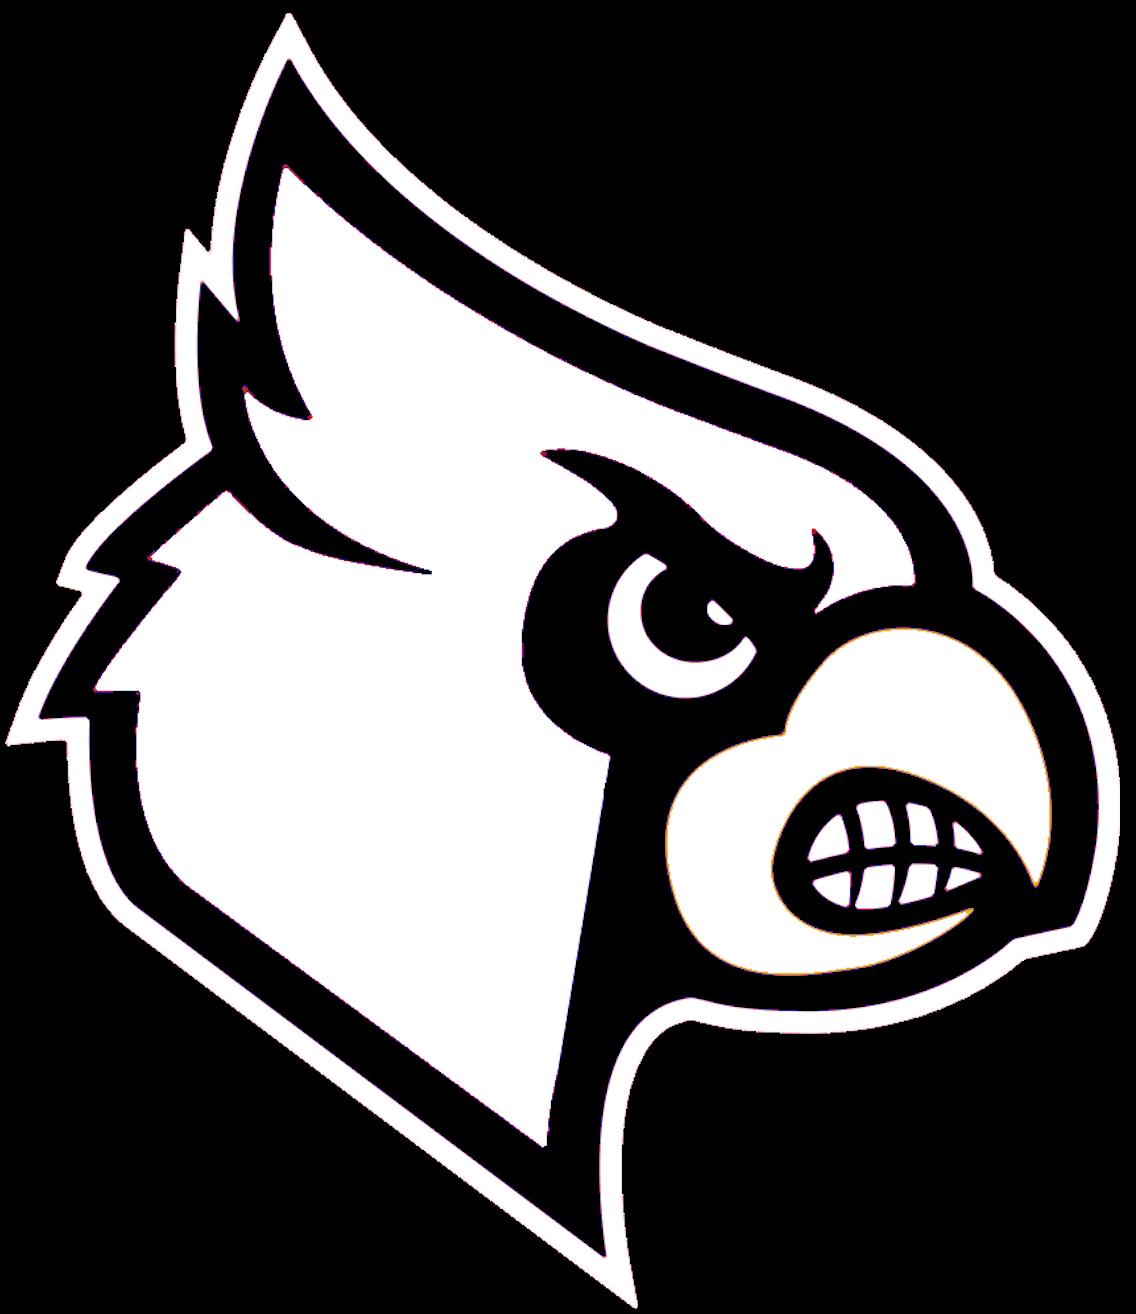 louisville cardinal logo